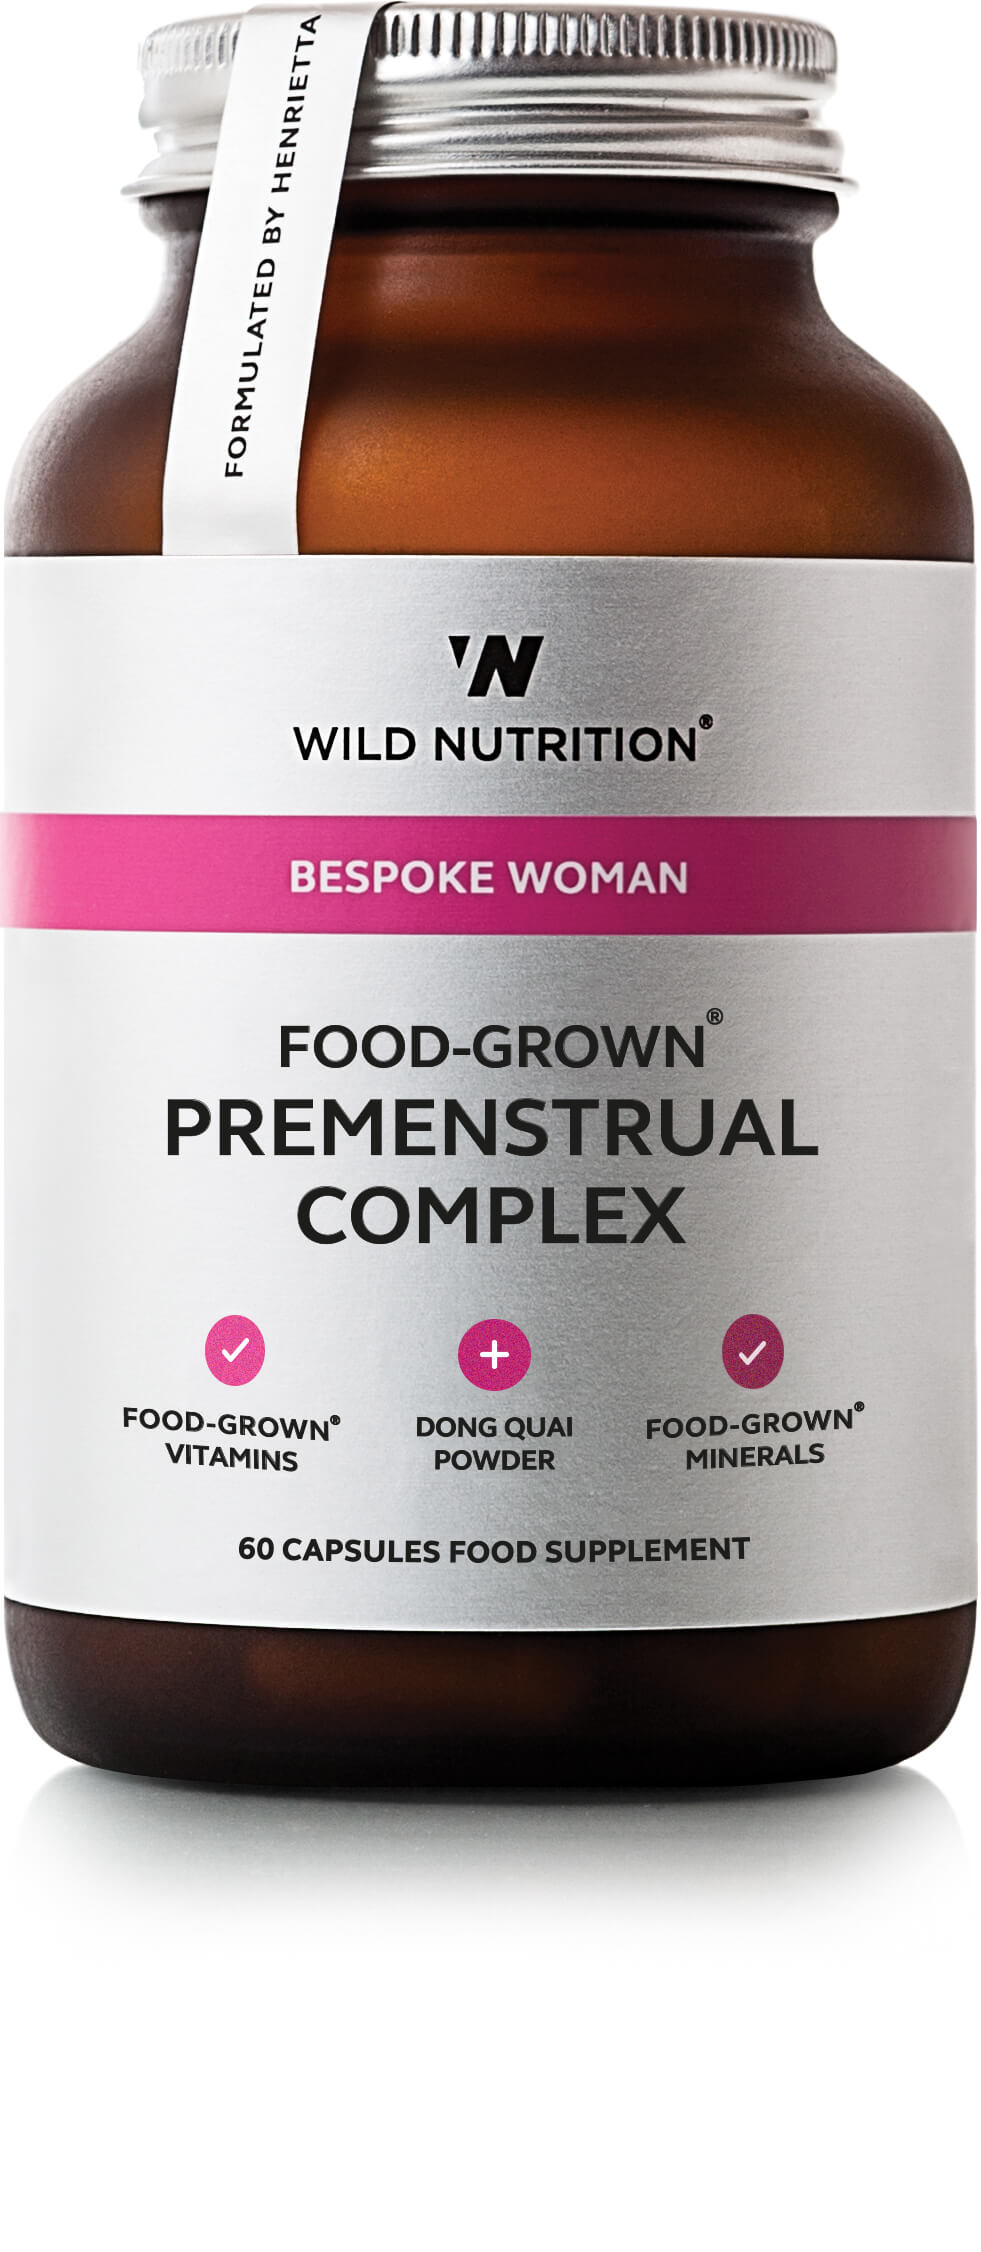 Bespoke Woman Food-Grown Premenstrual Complex 60's